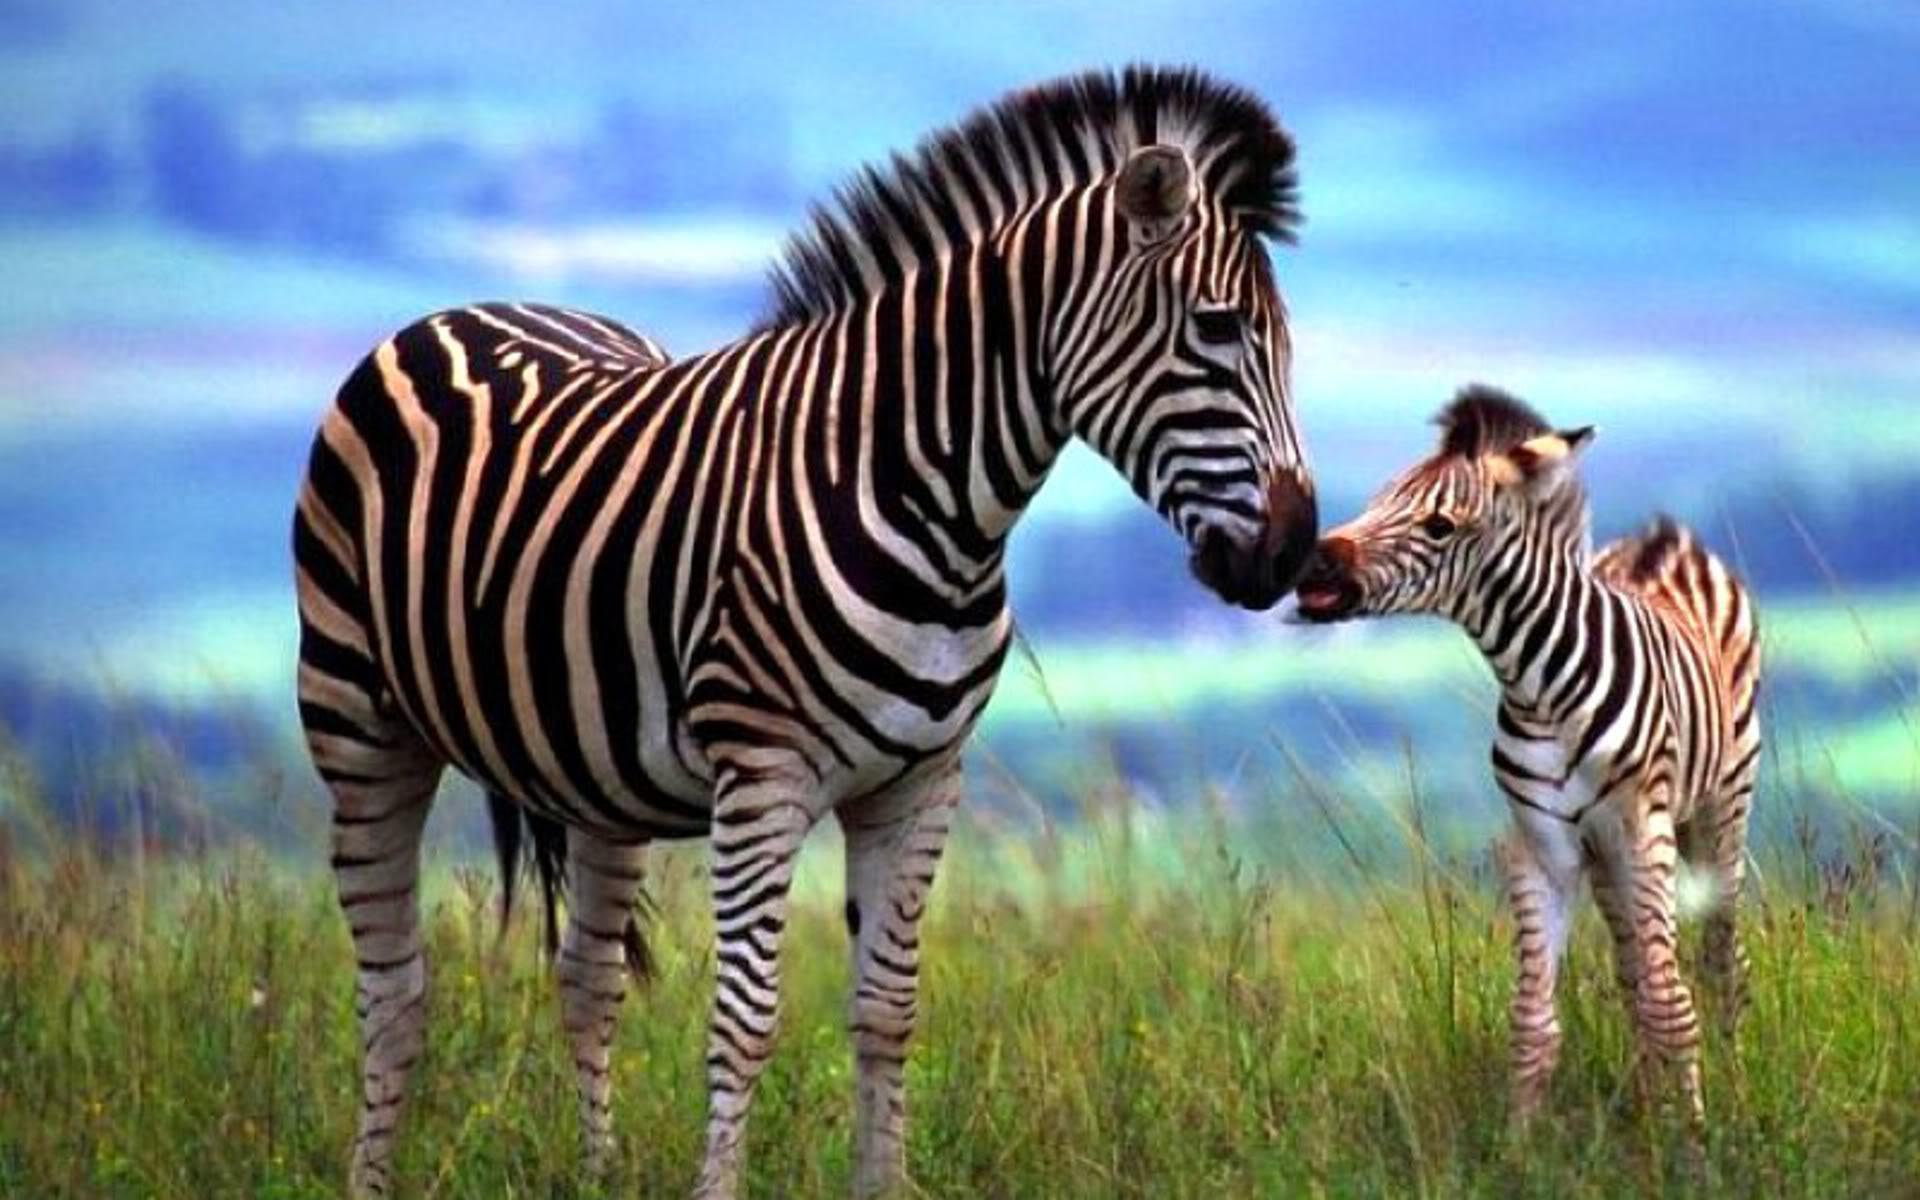 The Creation of Zebra Stripes